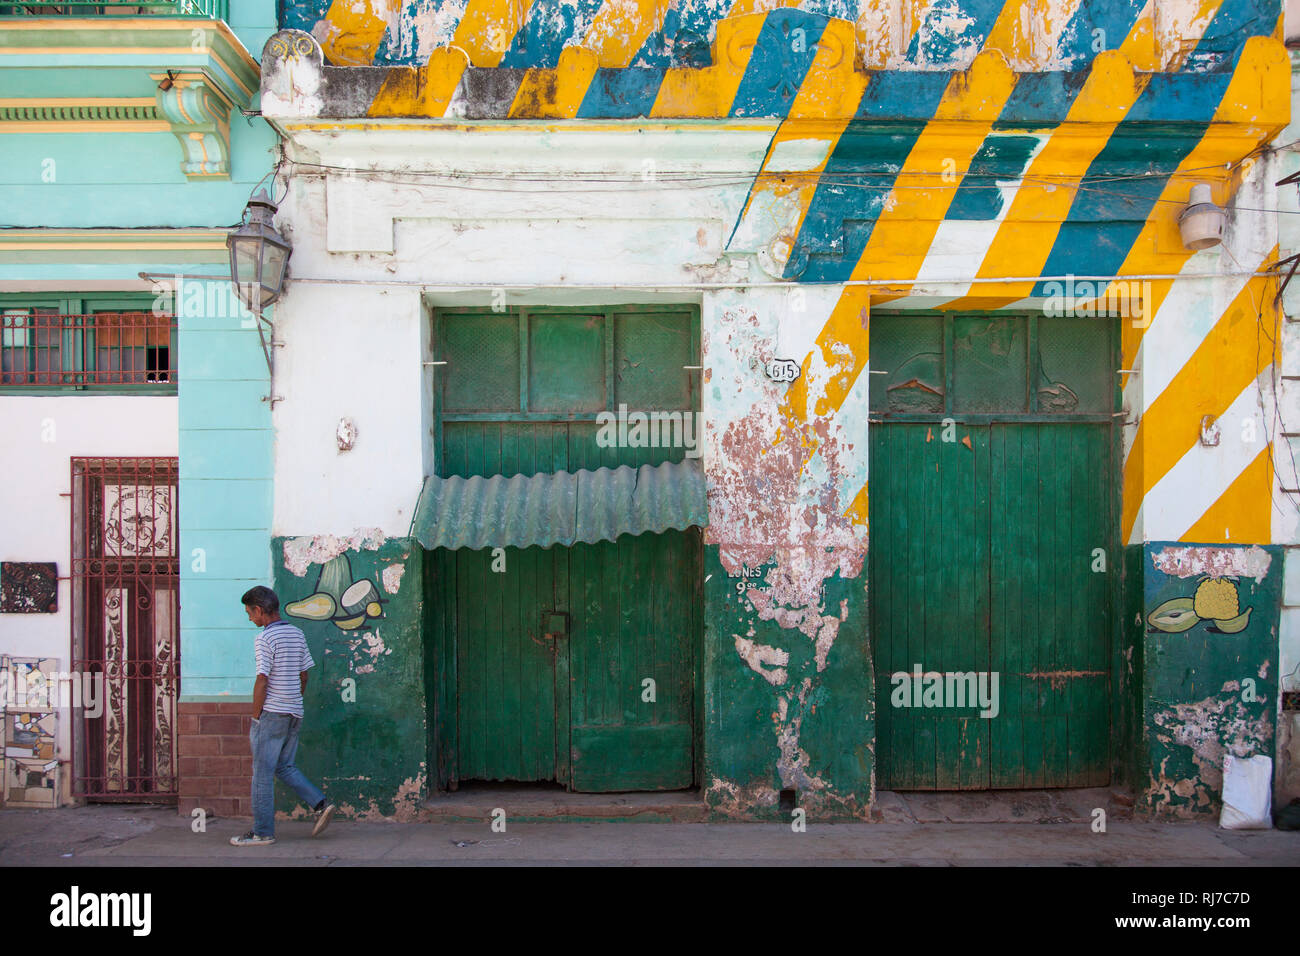 Karibik, Kuba, Cuba, Havanna, La Habana, bunte Hausfassade mit grünen Türen - Stock Image